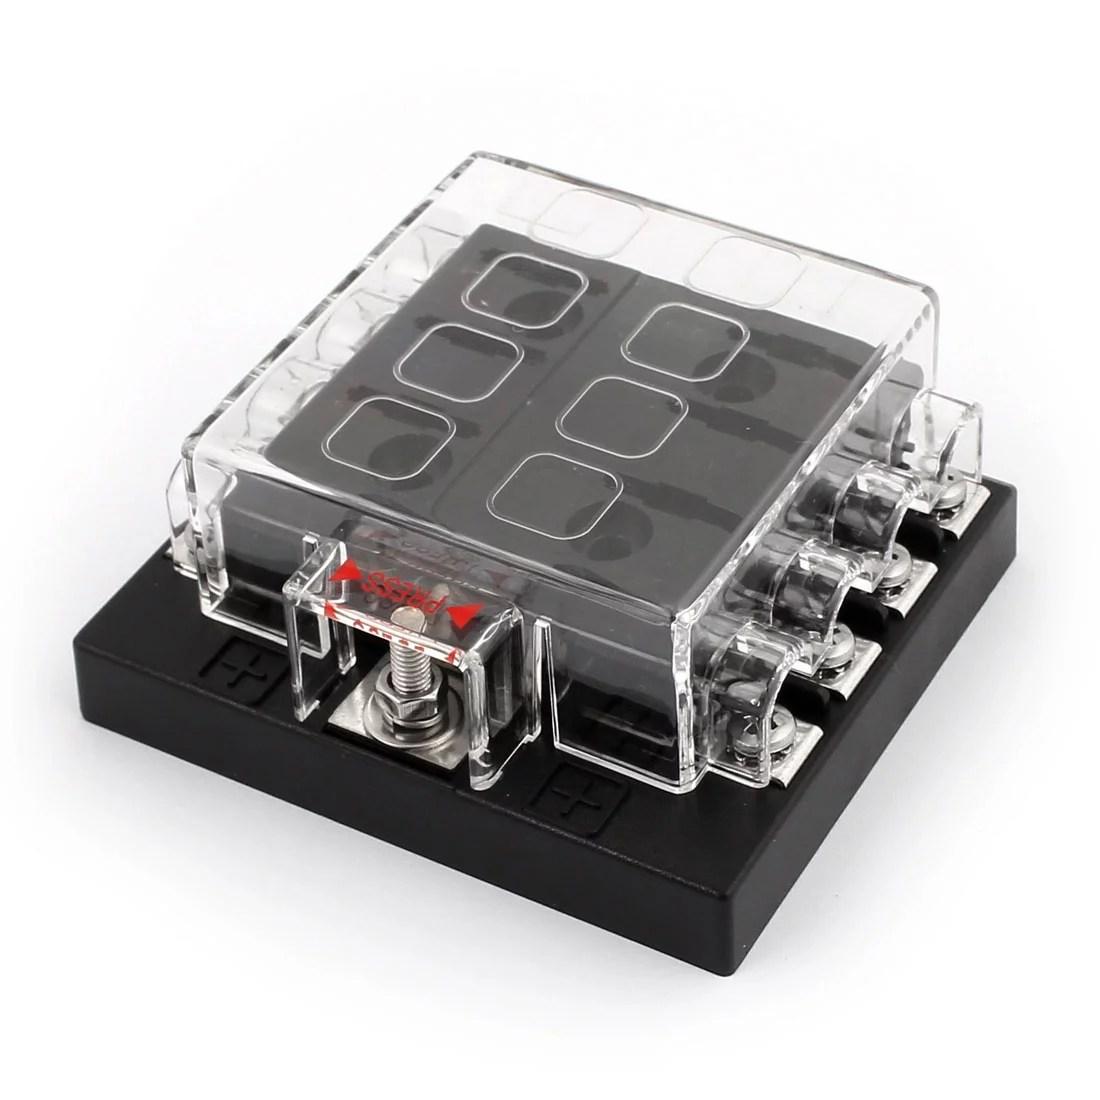 small resolution of 8 fuse block holder box wiring diagram dat 8 fuse block holder box